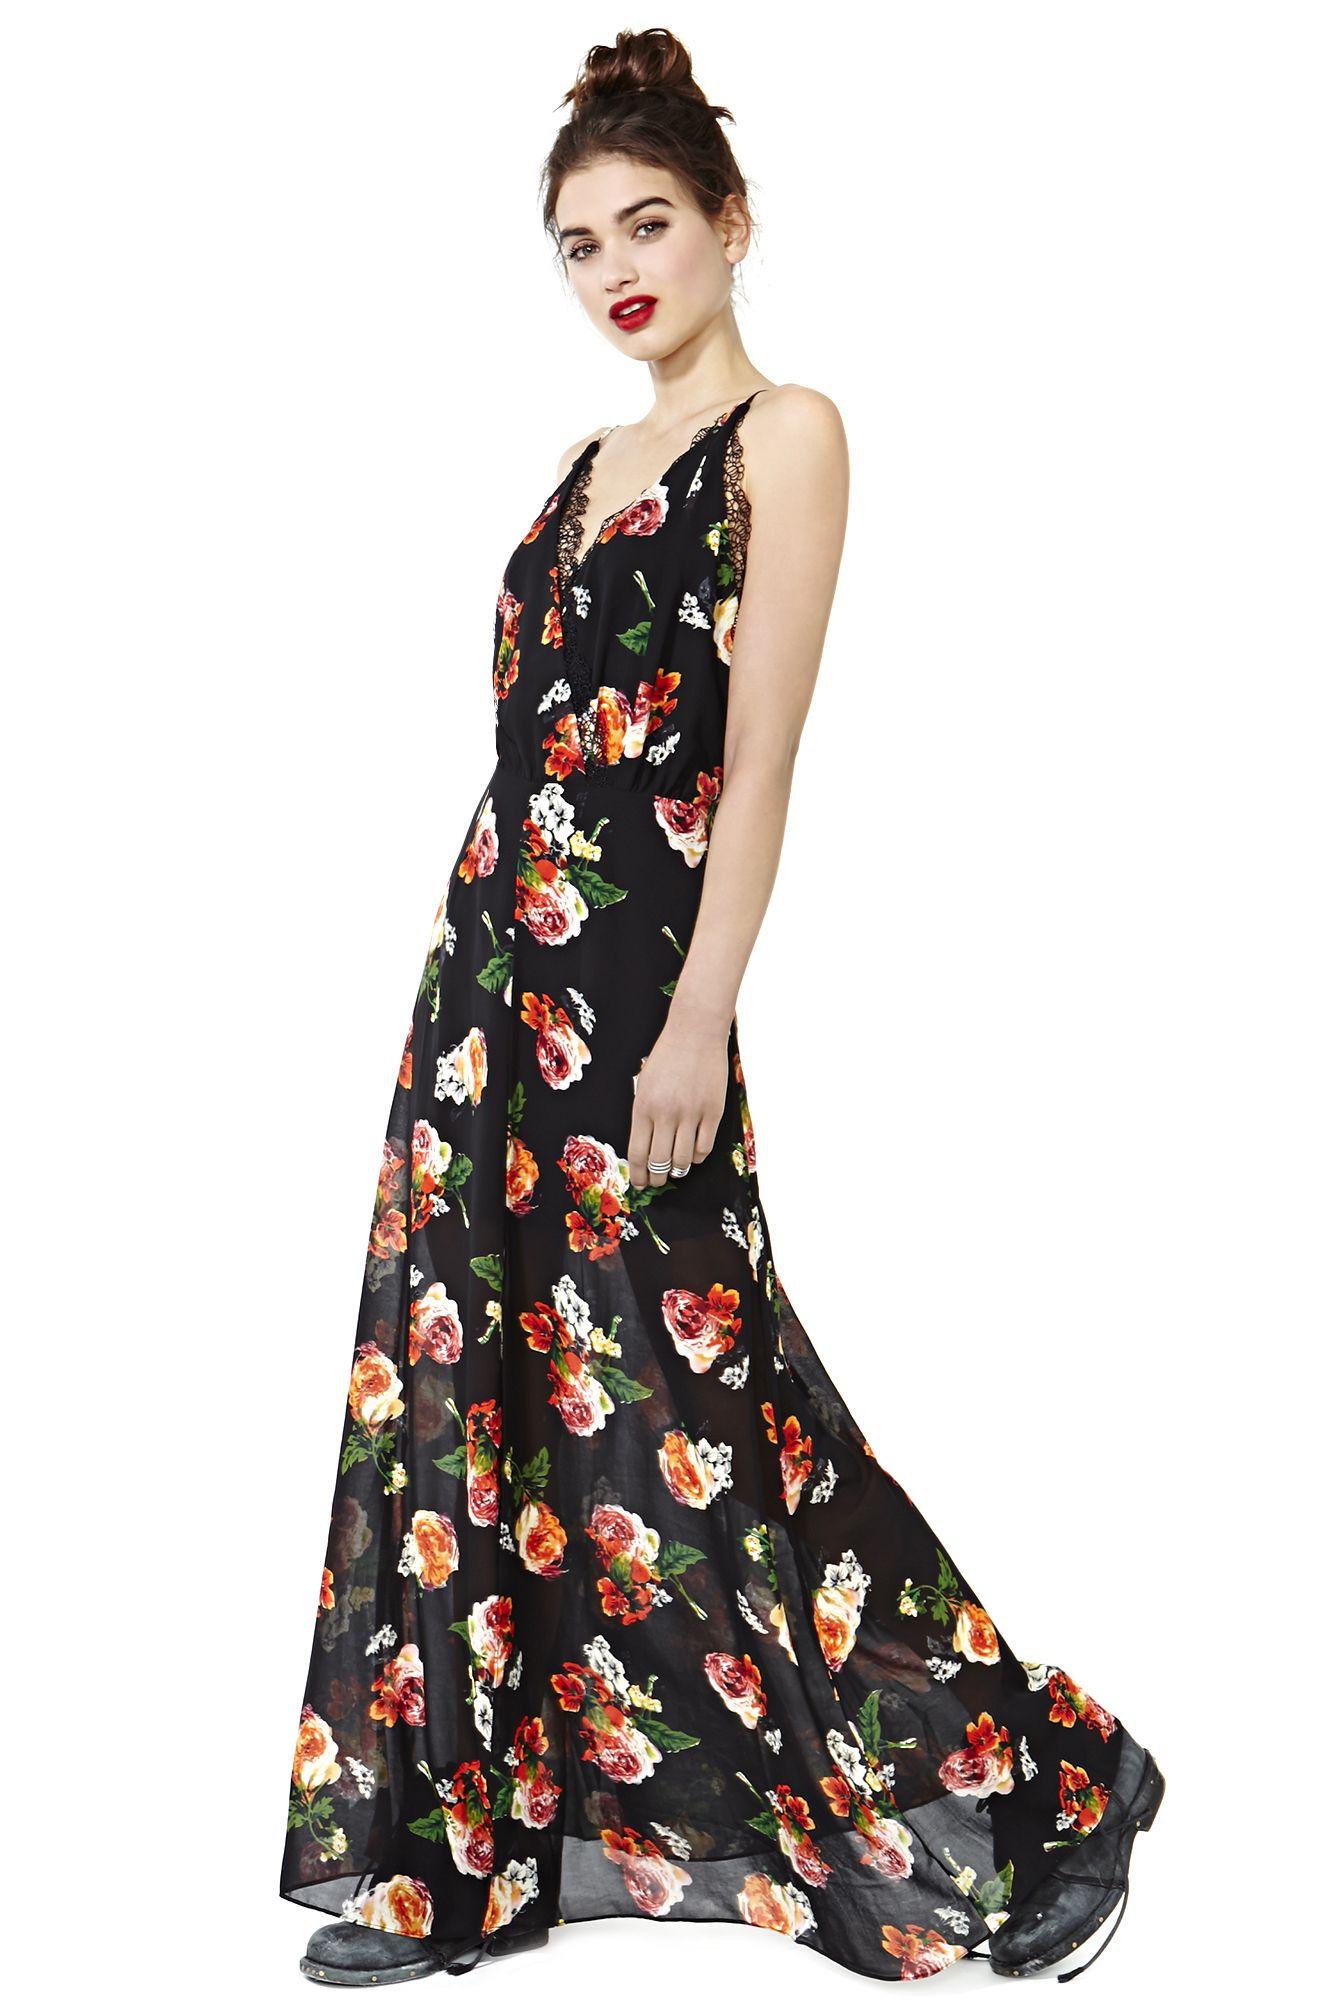 Camo Prom Dresses Colorful Prom Dresses